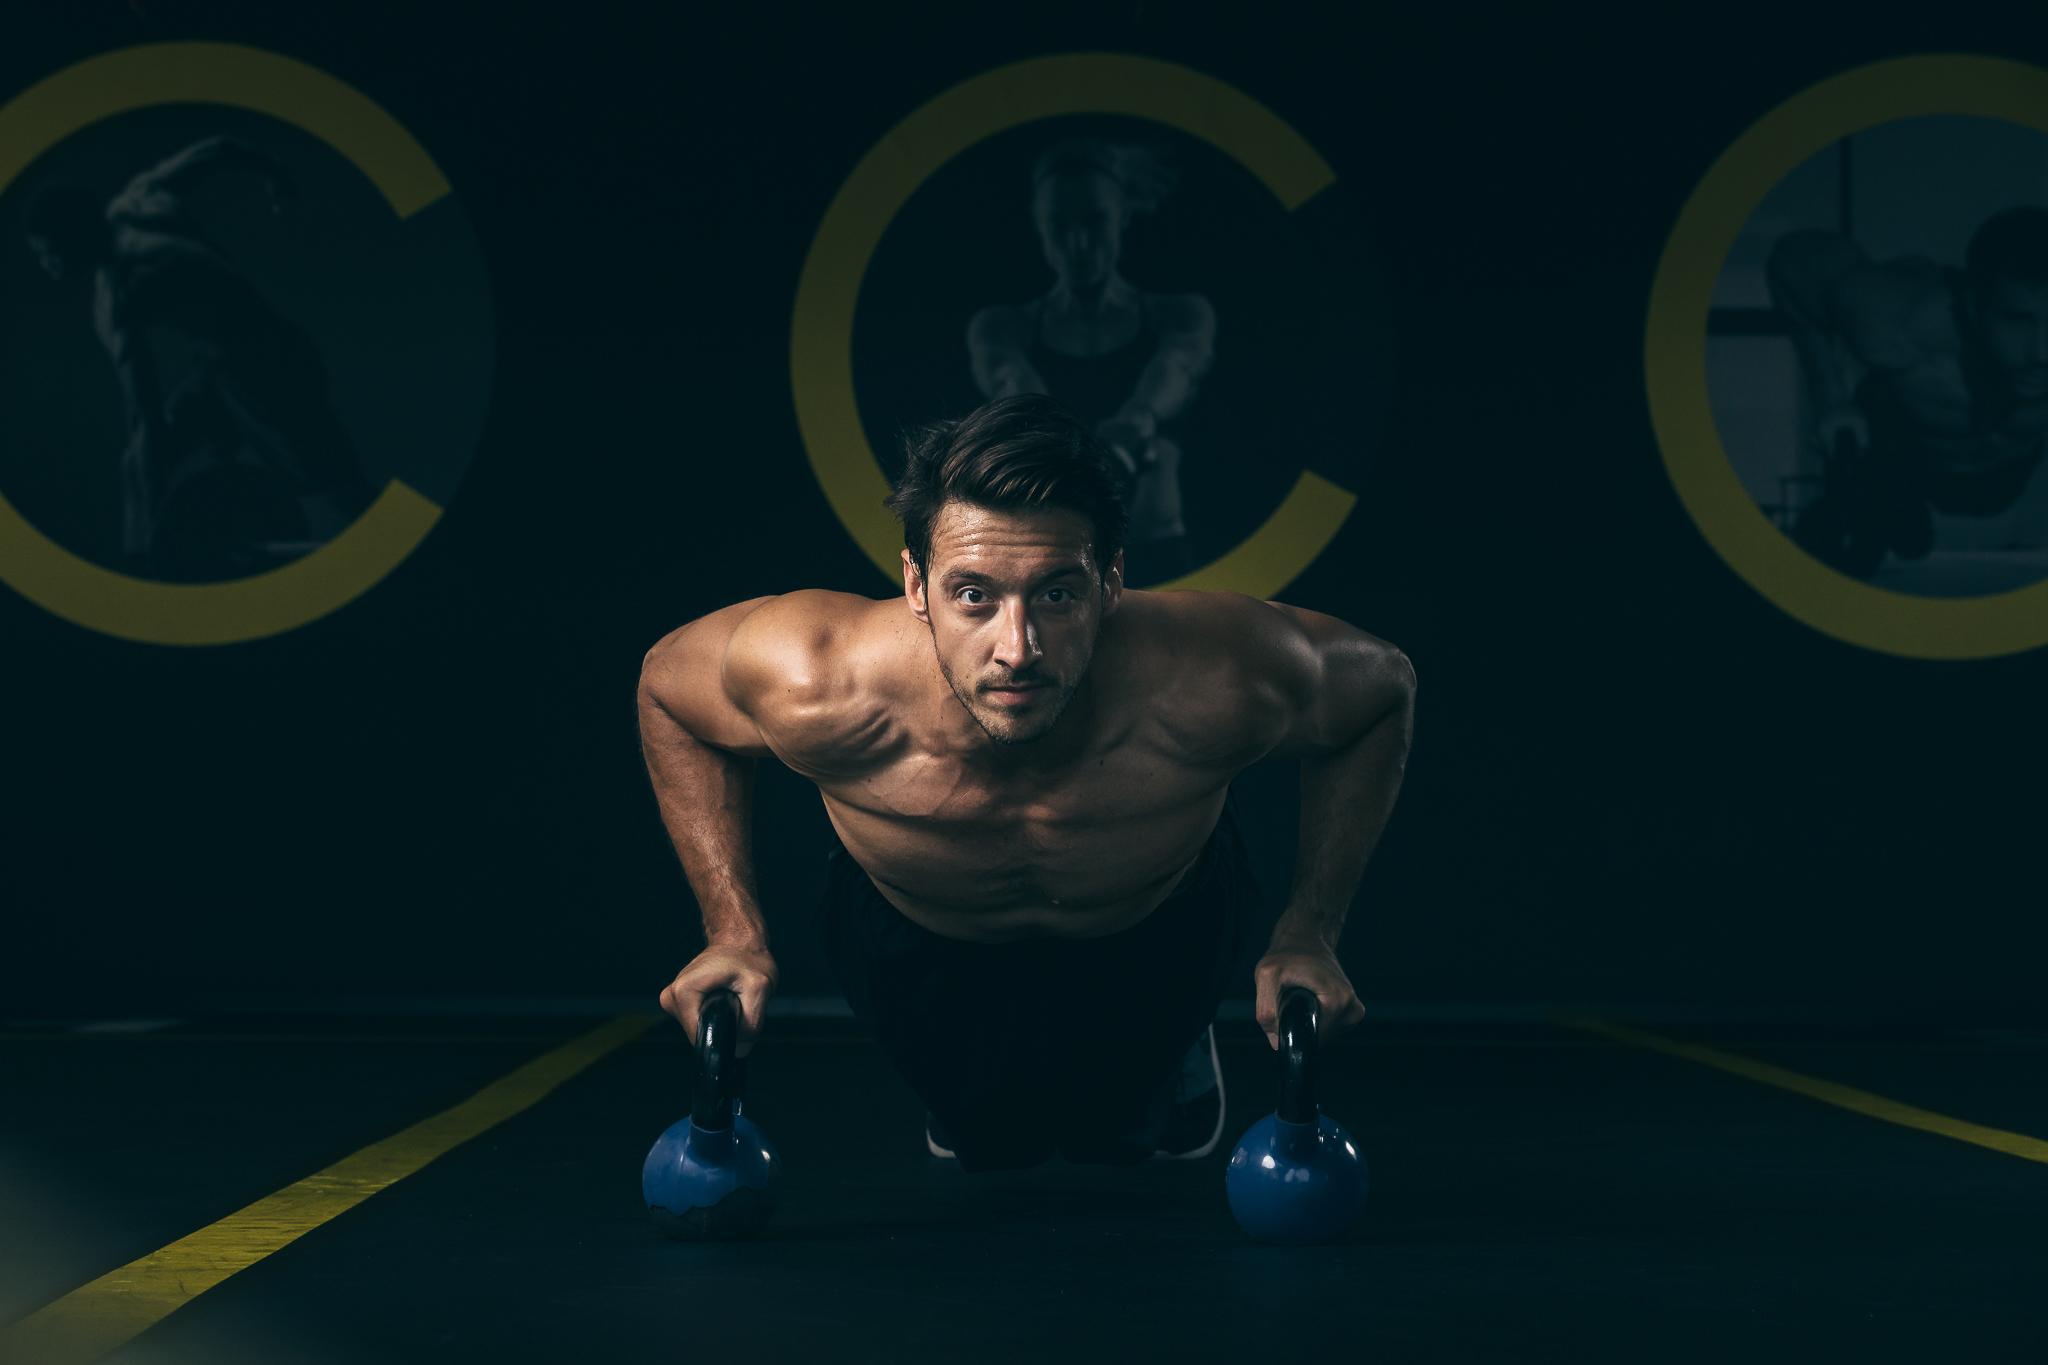 kostis sohoritis fitness photography Giorgos Kitsantas Concept One 10.jpg